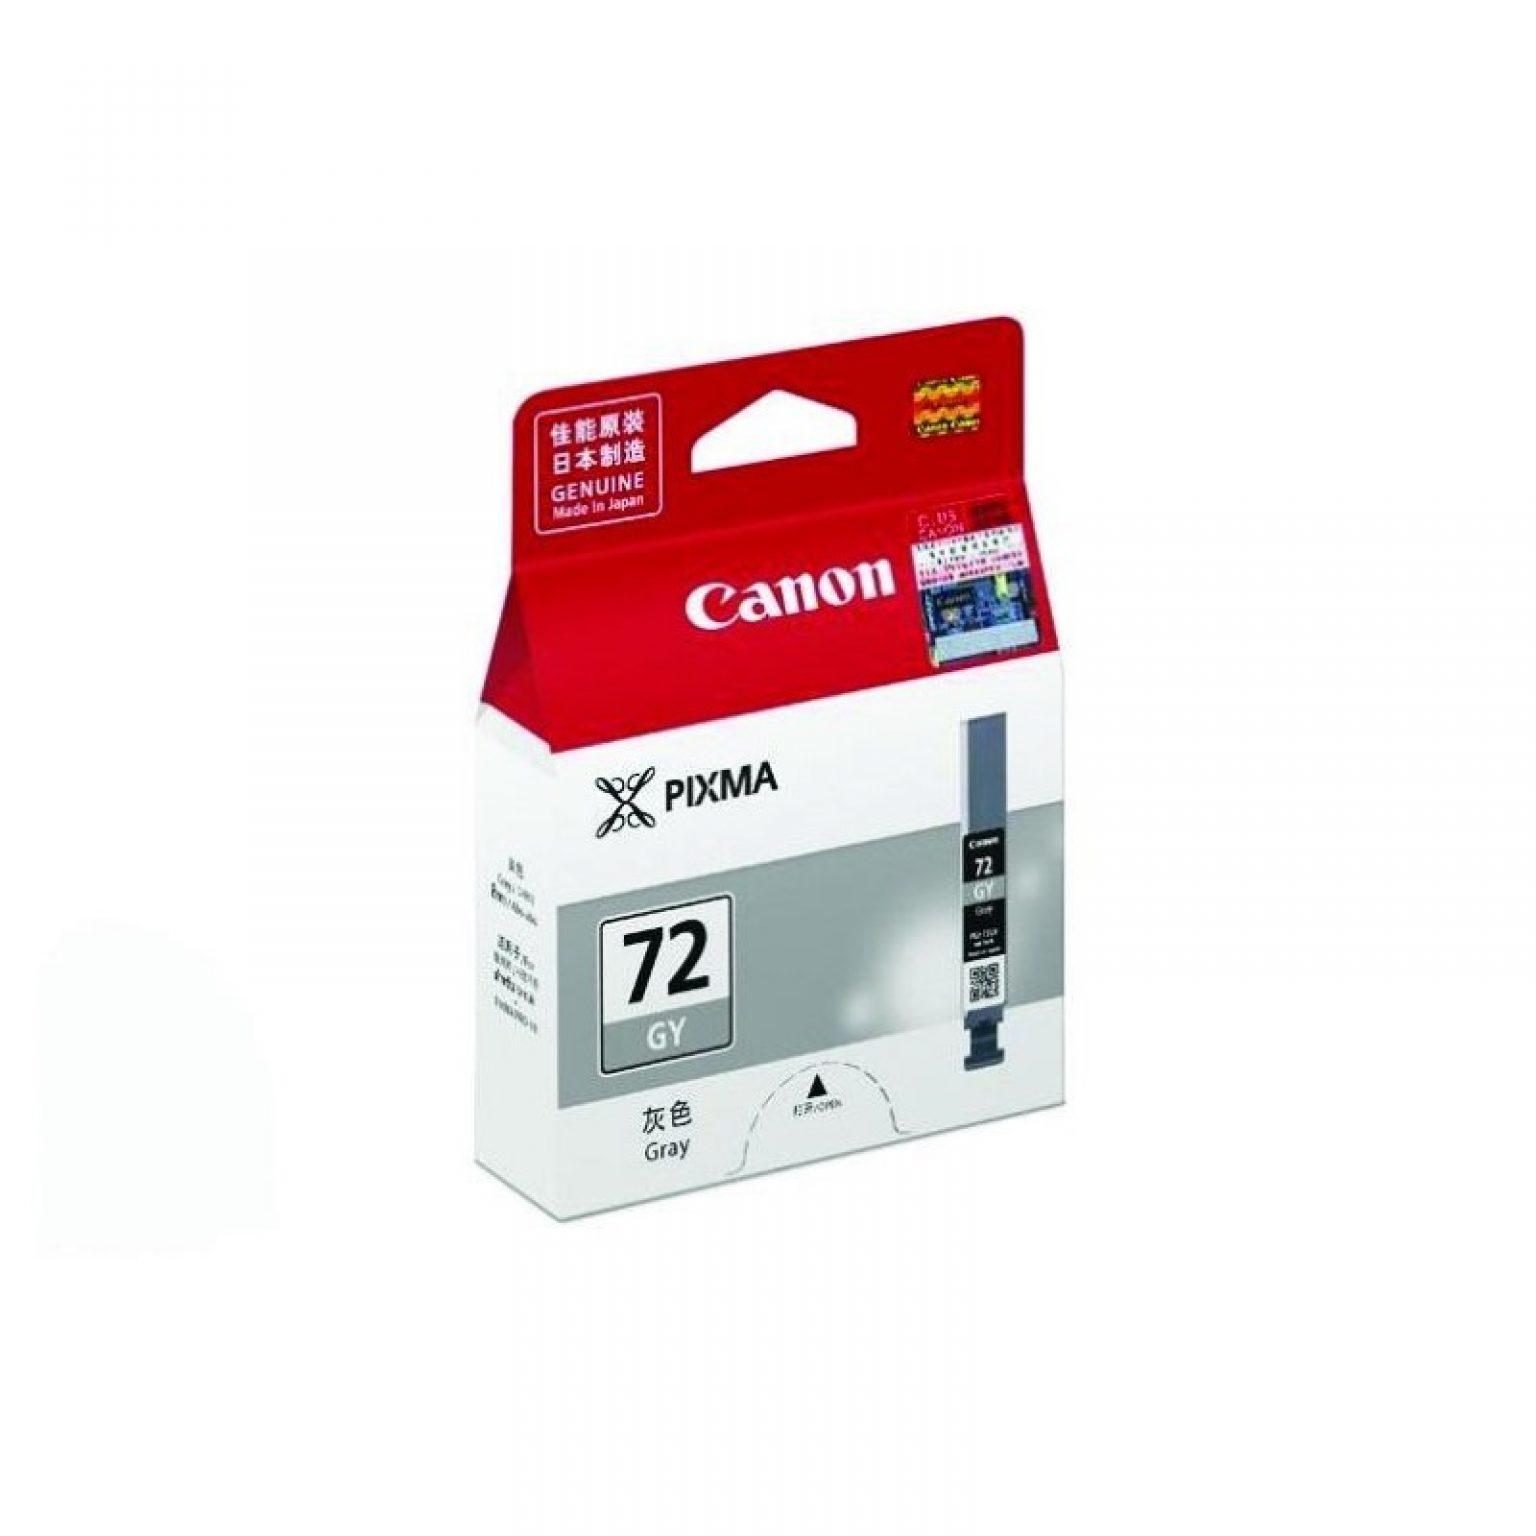 CANON - Ink Cartridge PGI-72 Grey for Pro-10 [PGI72GY]